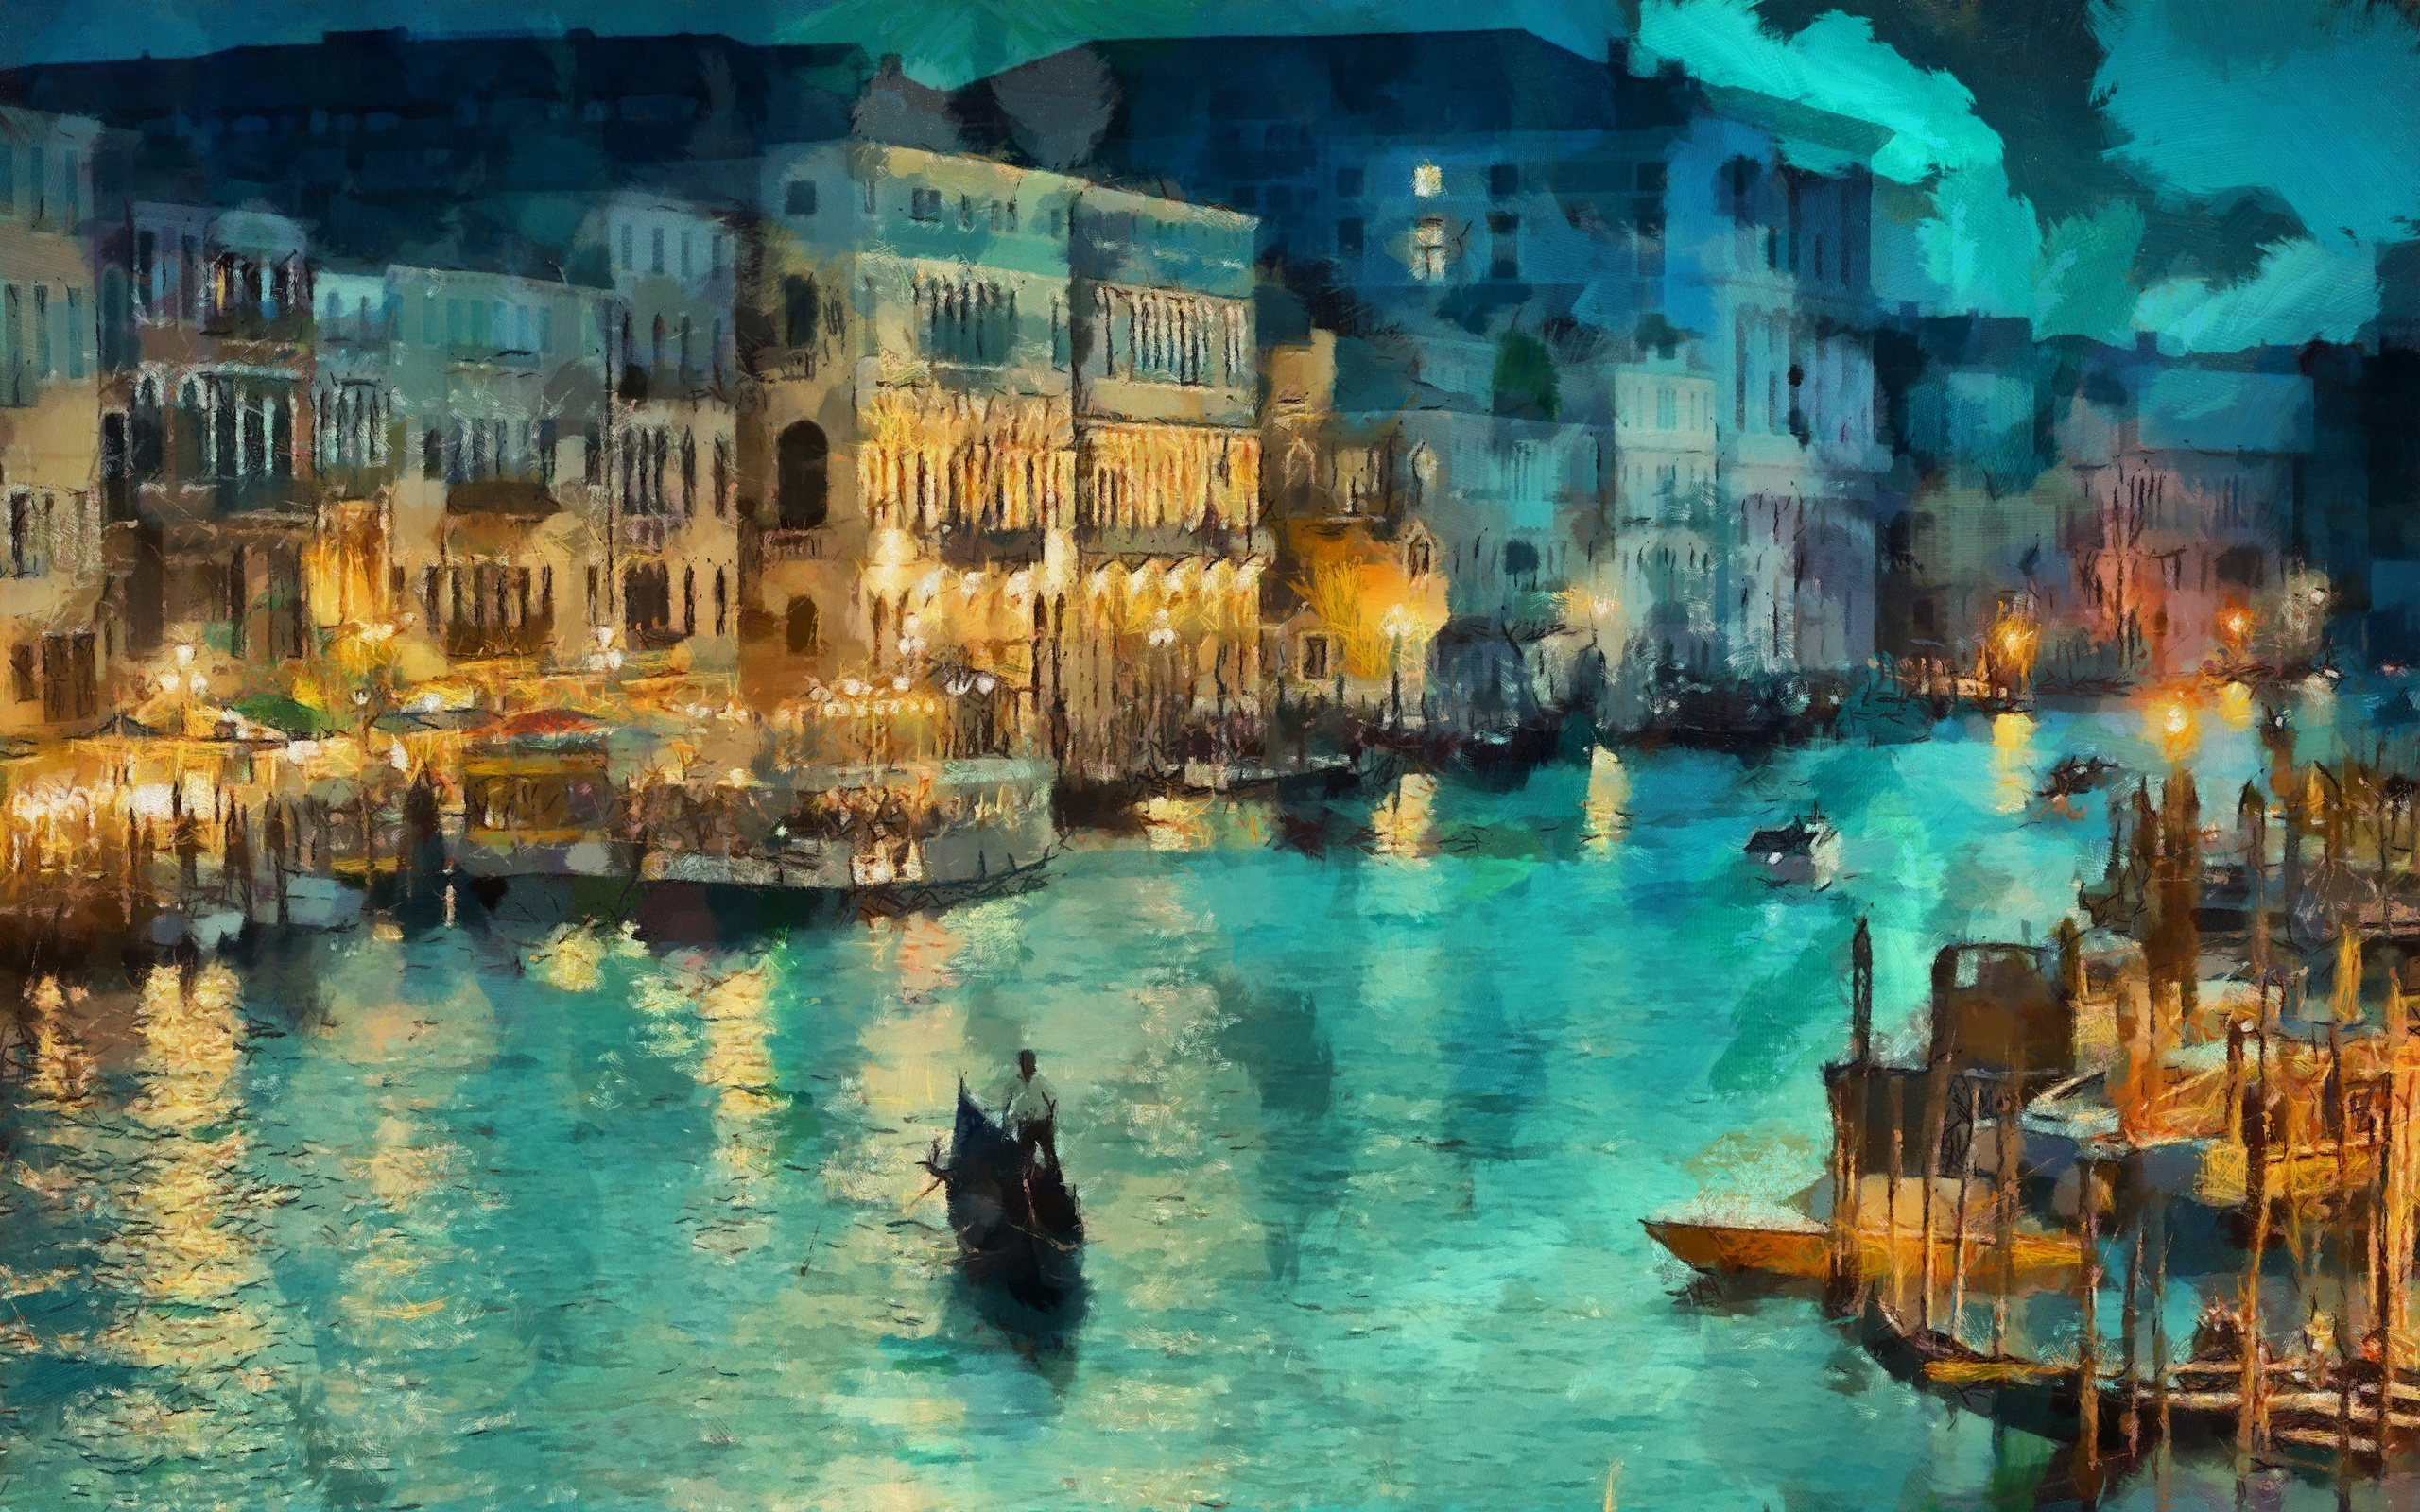 50 Beautiful Painting Art To Get Inspire - Oil Painting Wallpaper 4k - HD Wallpaper